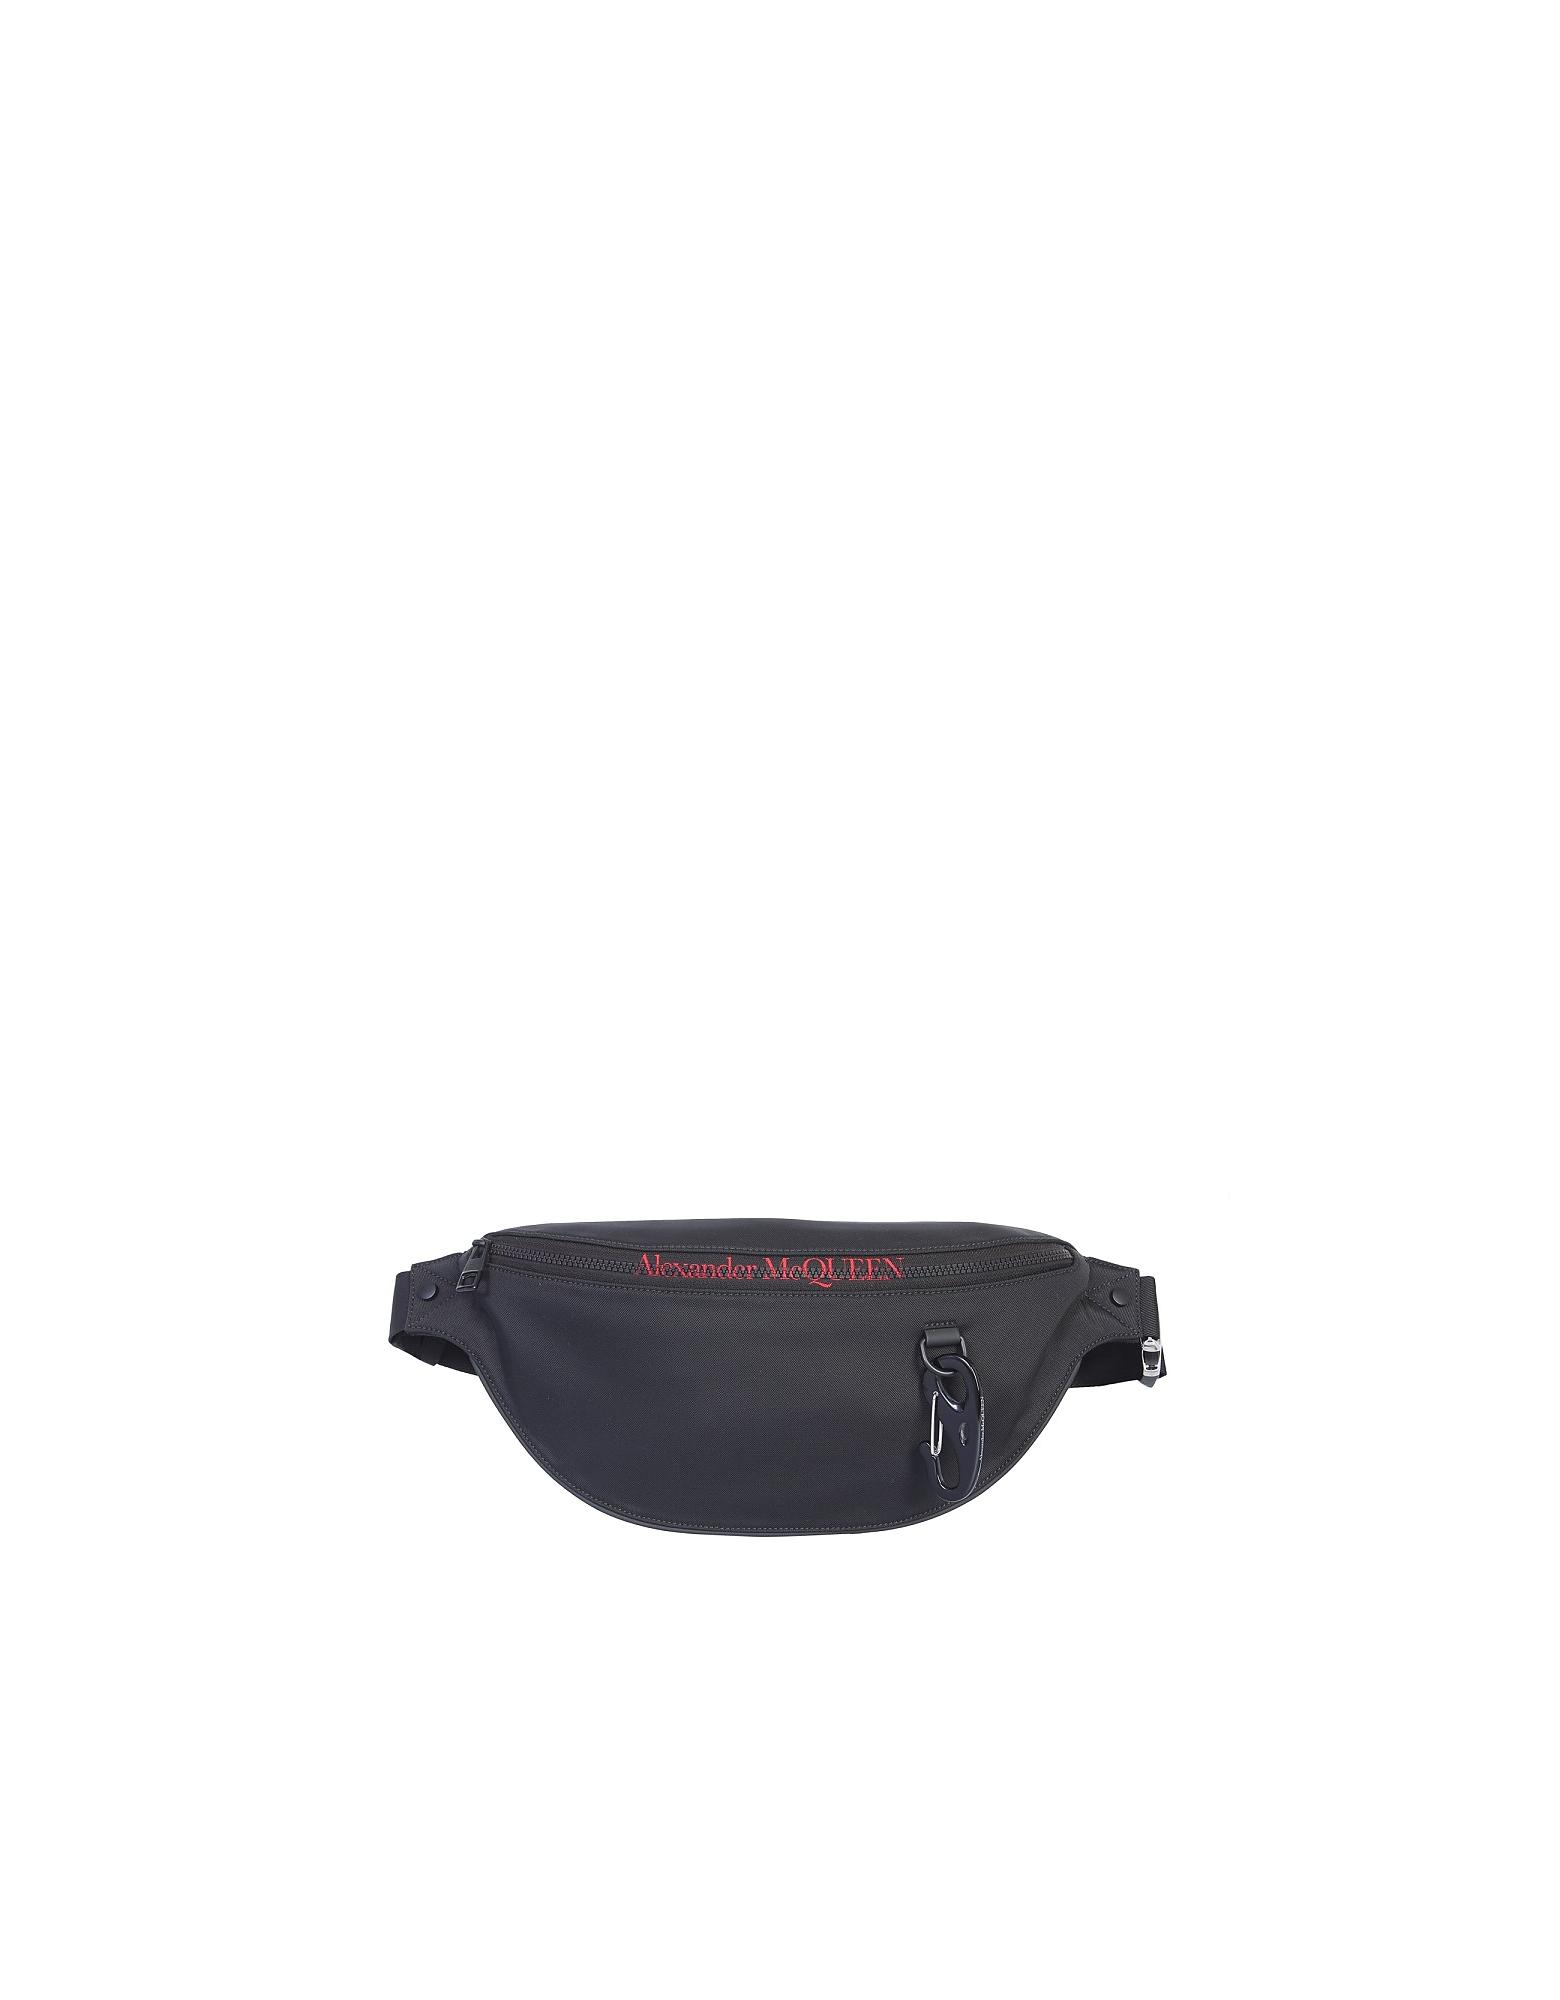 Alexander McQueen Designer Men's Bags, Pouch With Logo